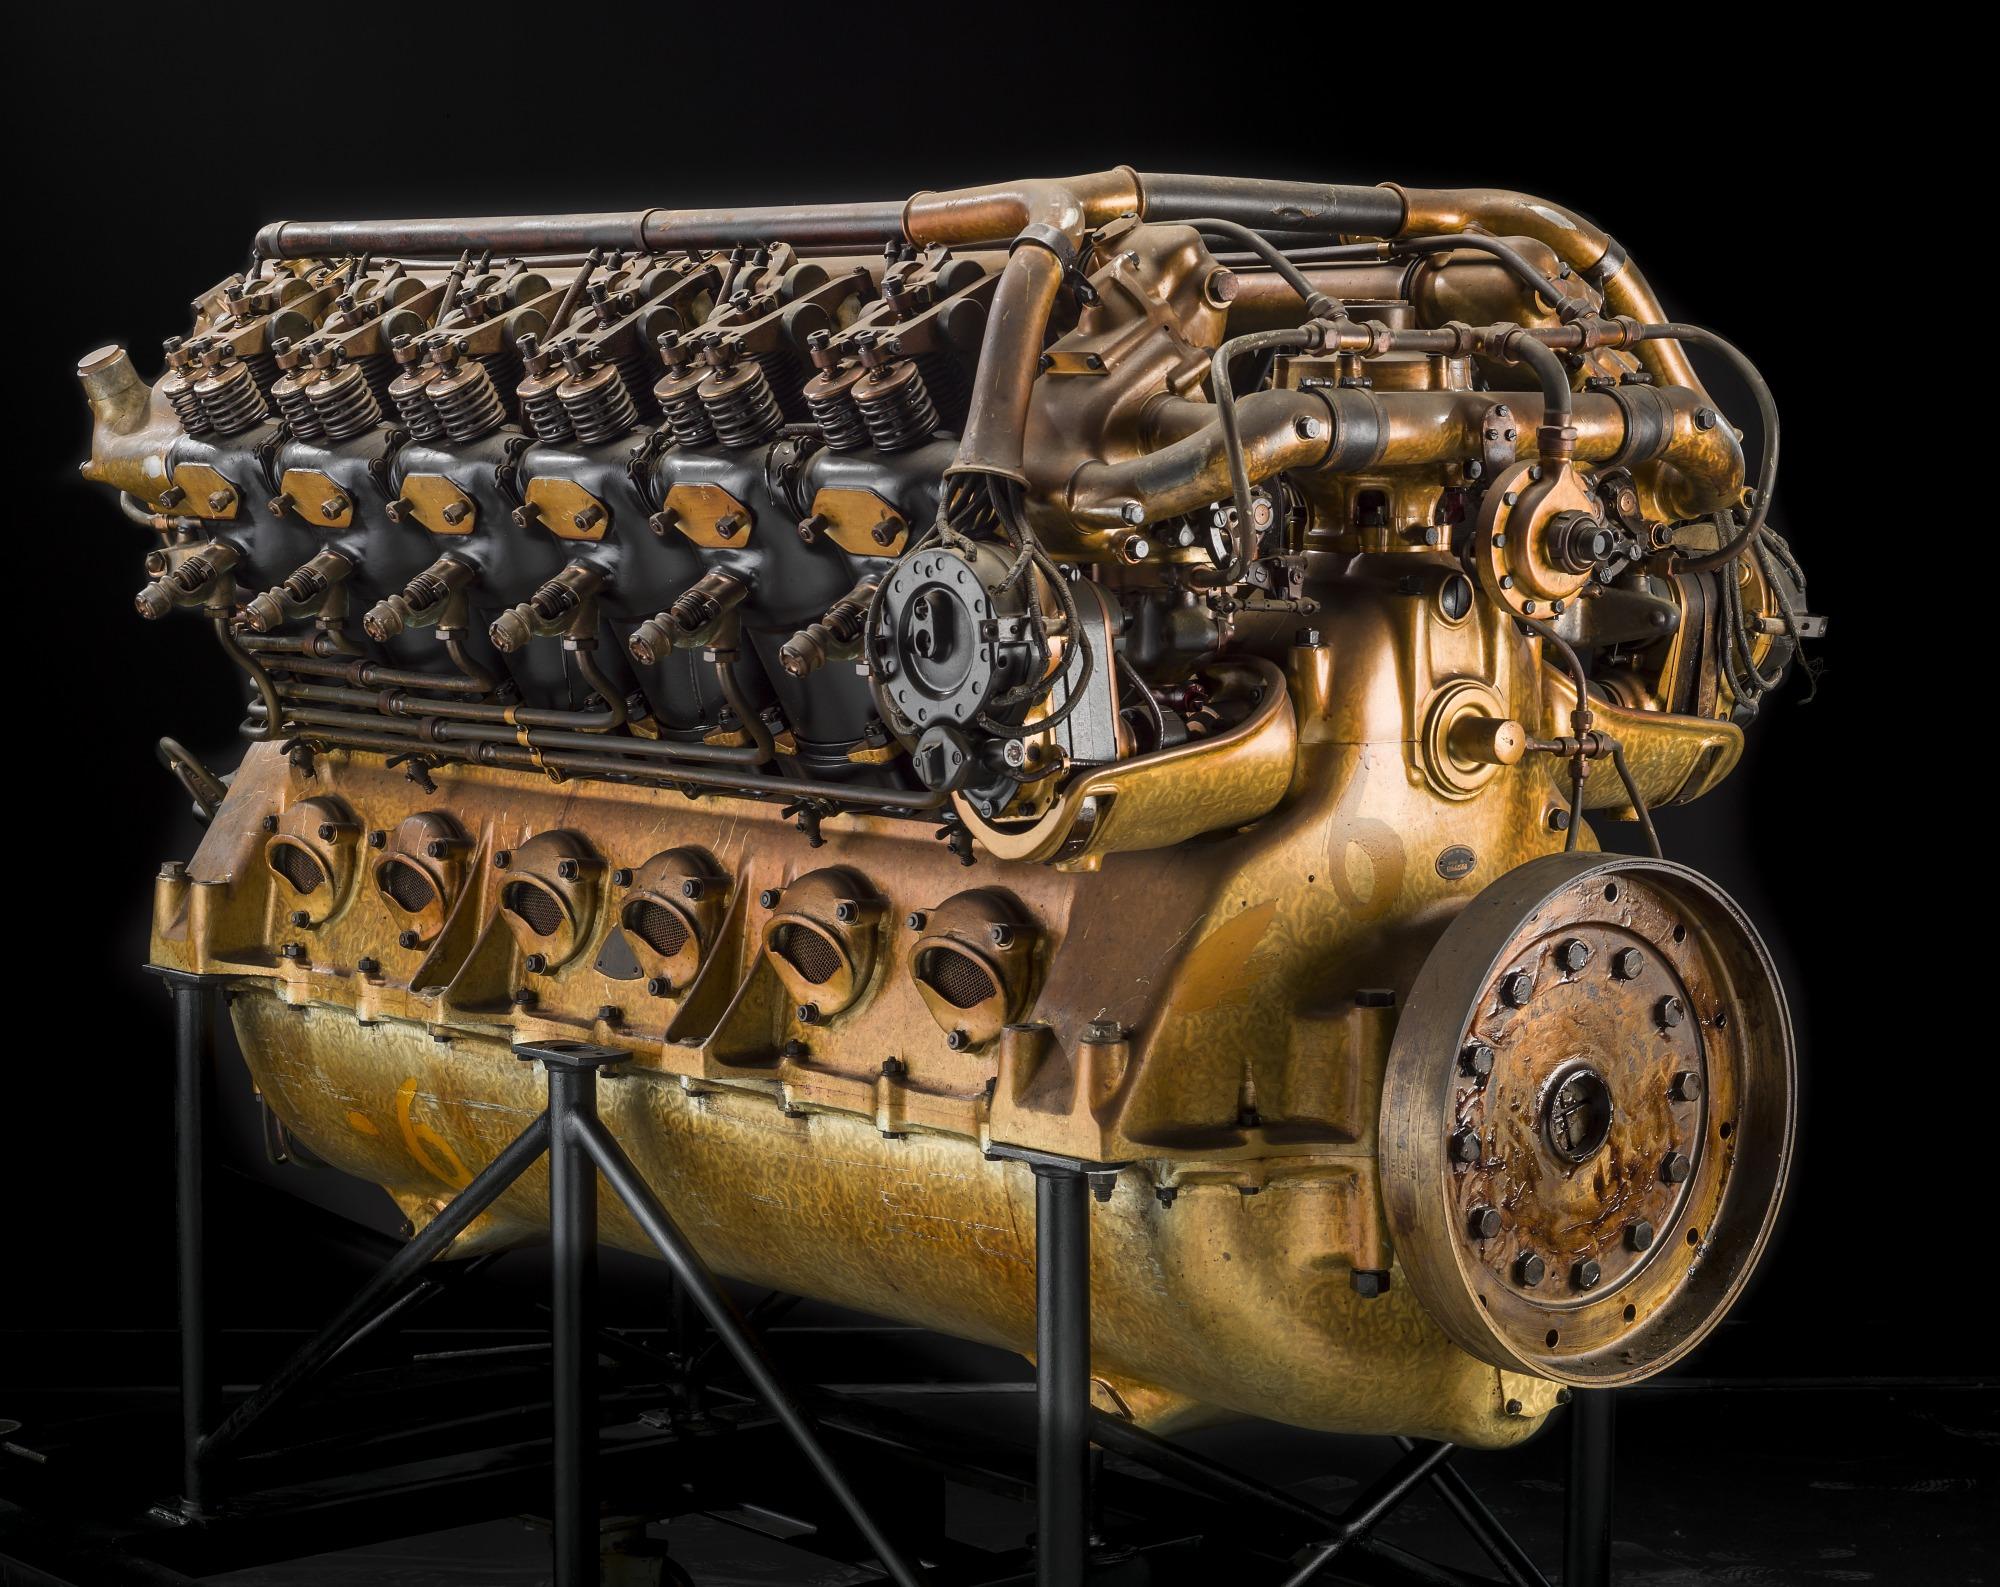 Maybach VL-2, V-12 Engine - Image version 0